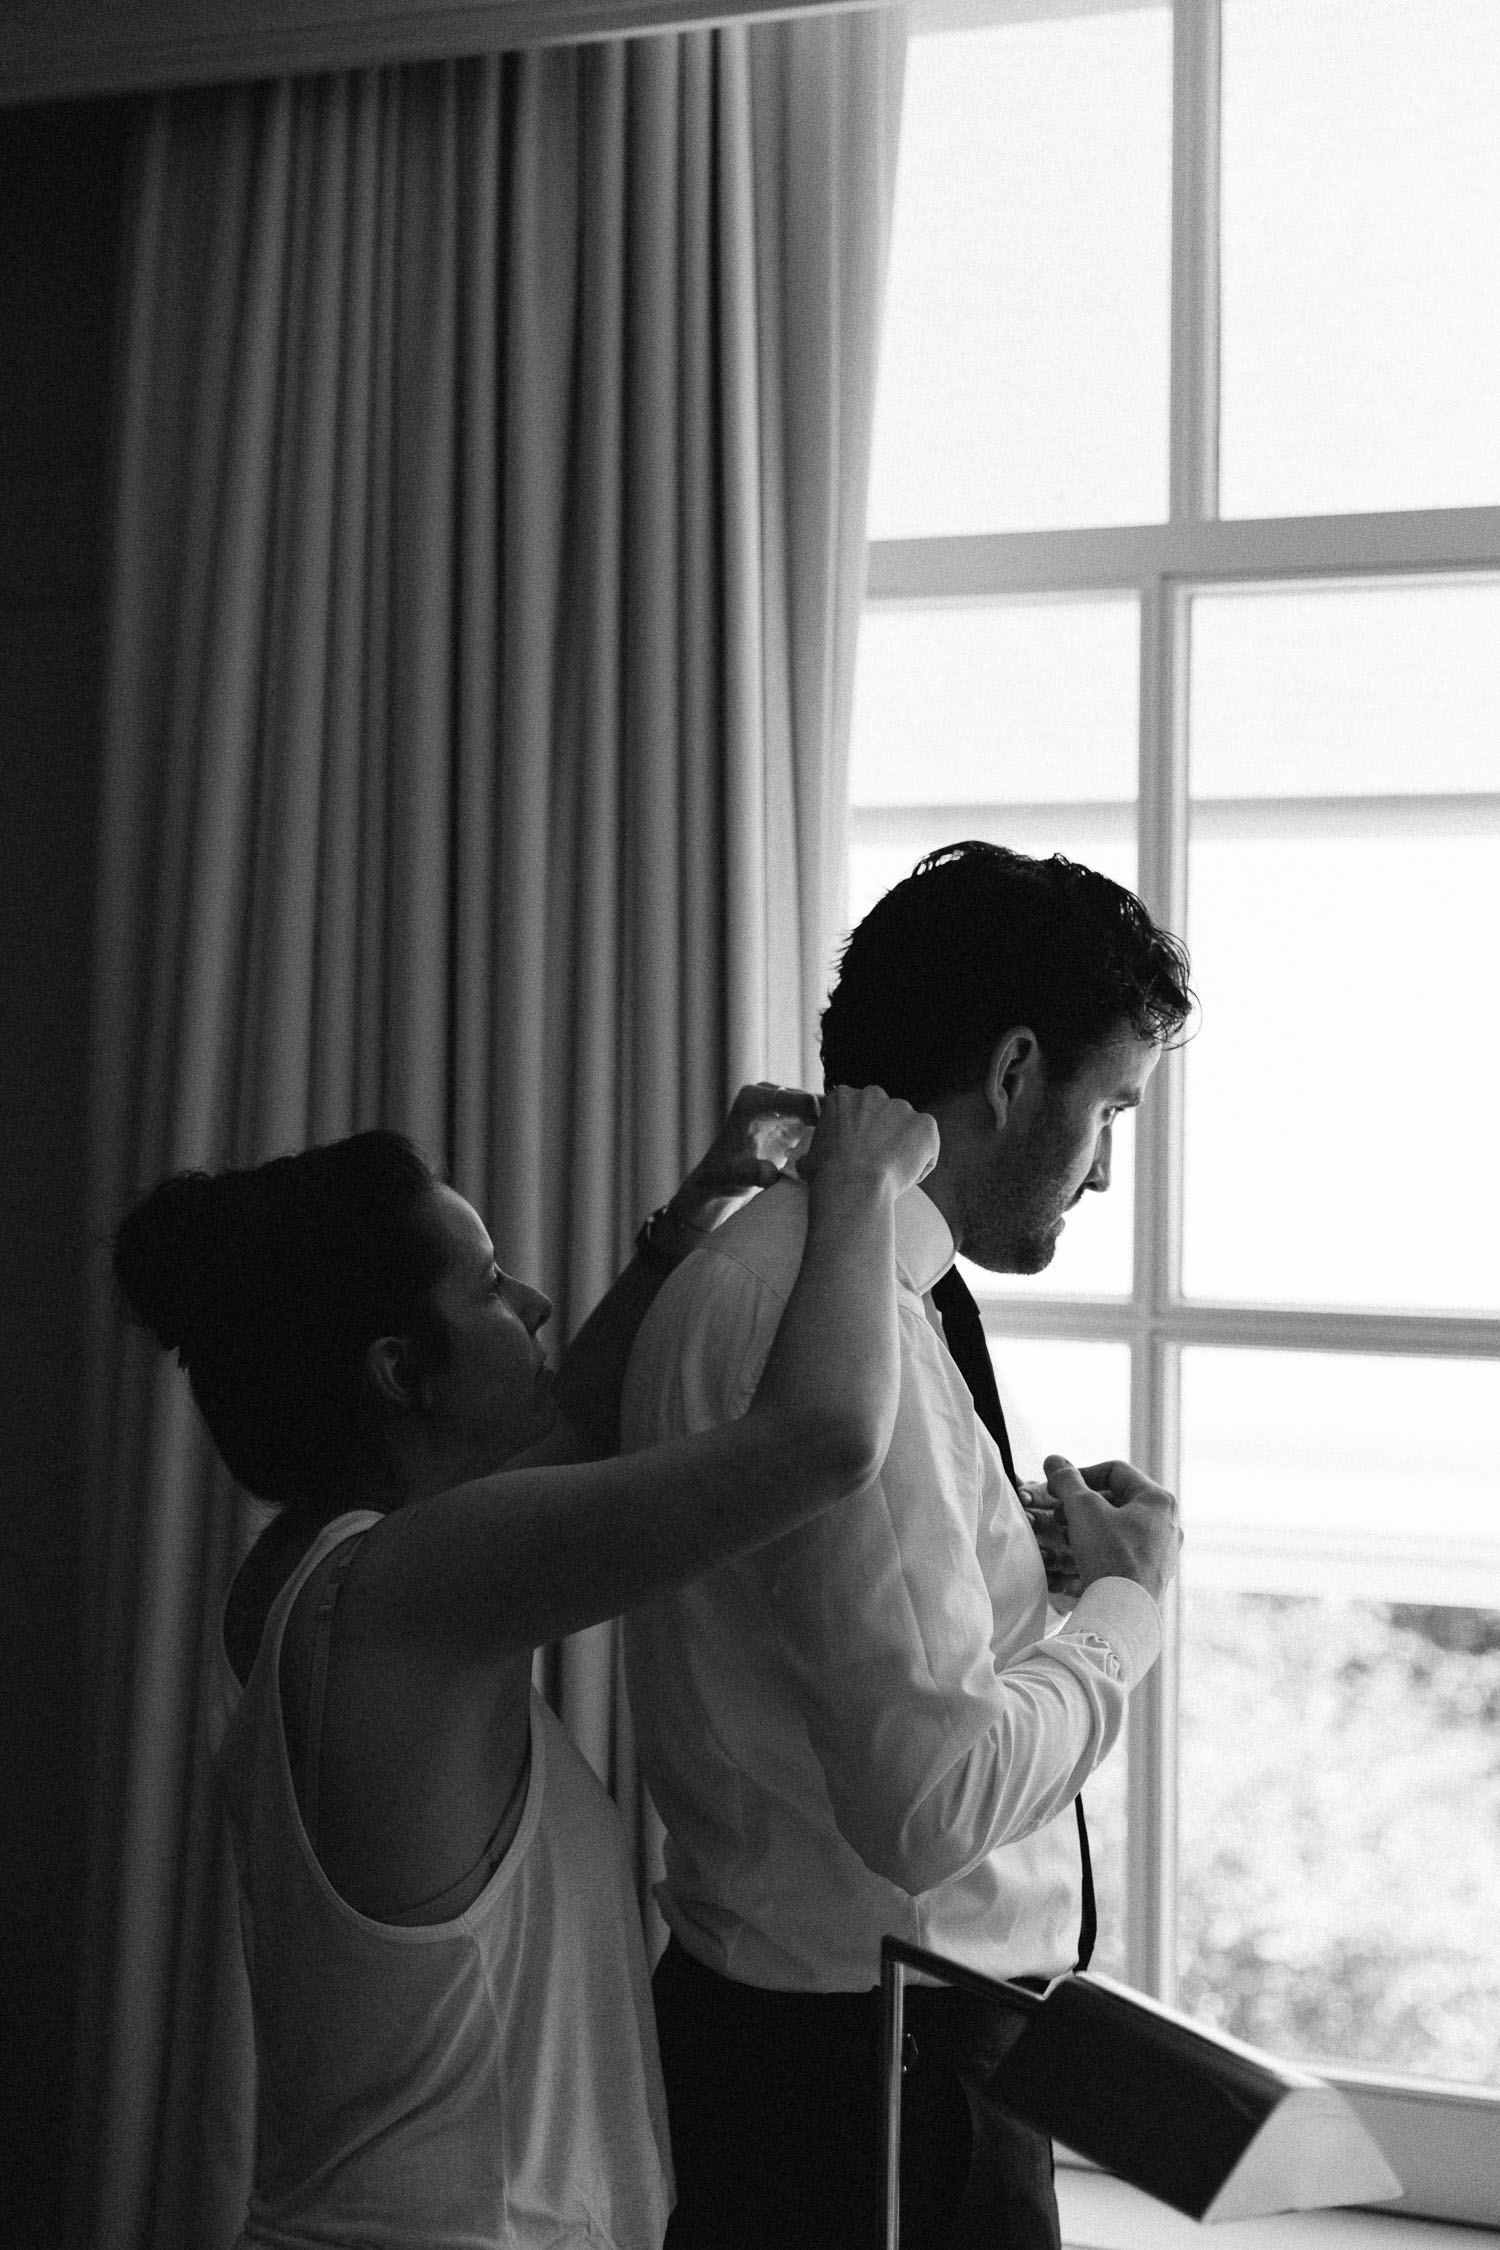 Backyard-wedding-Bruiloft-Annemiek-David-fotografie-photography-On-a-hazy-morning-Amsterdam-The-Netherlands009.jpg